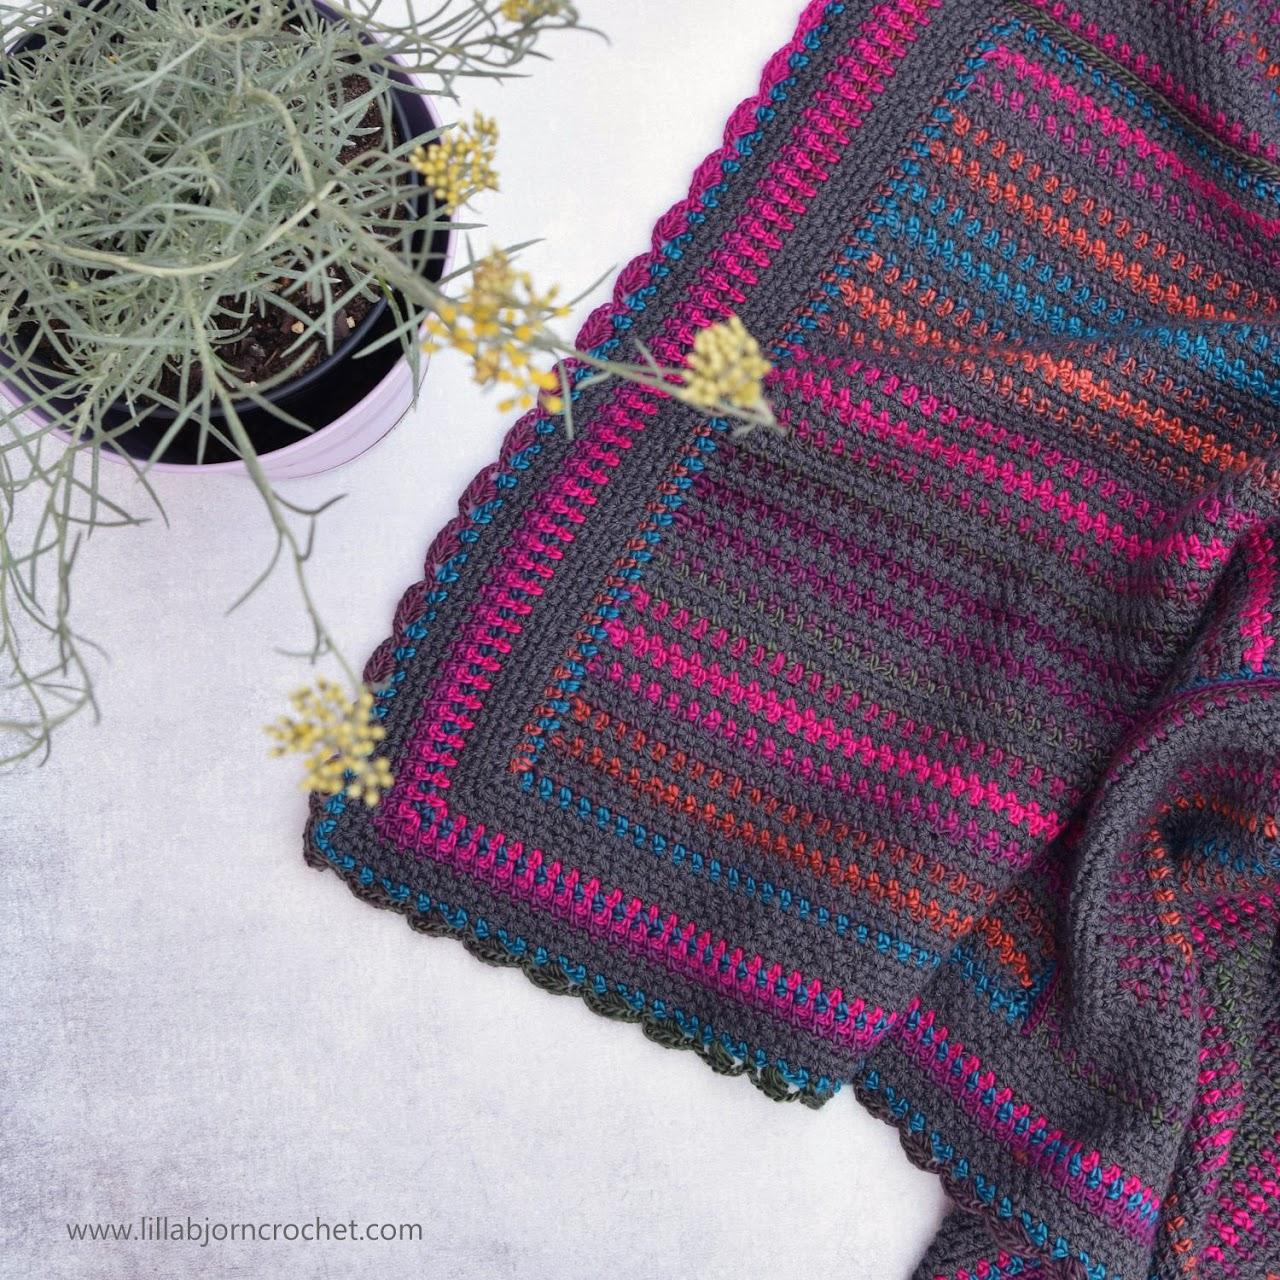 Around the World crochet blanket by www.lillabjorncrochet.com